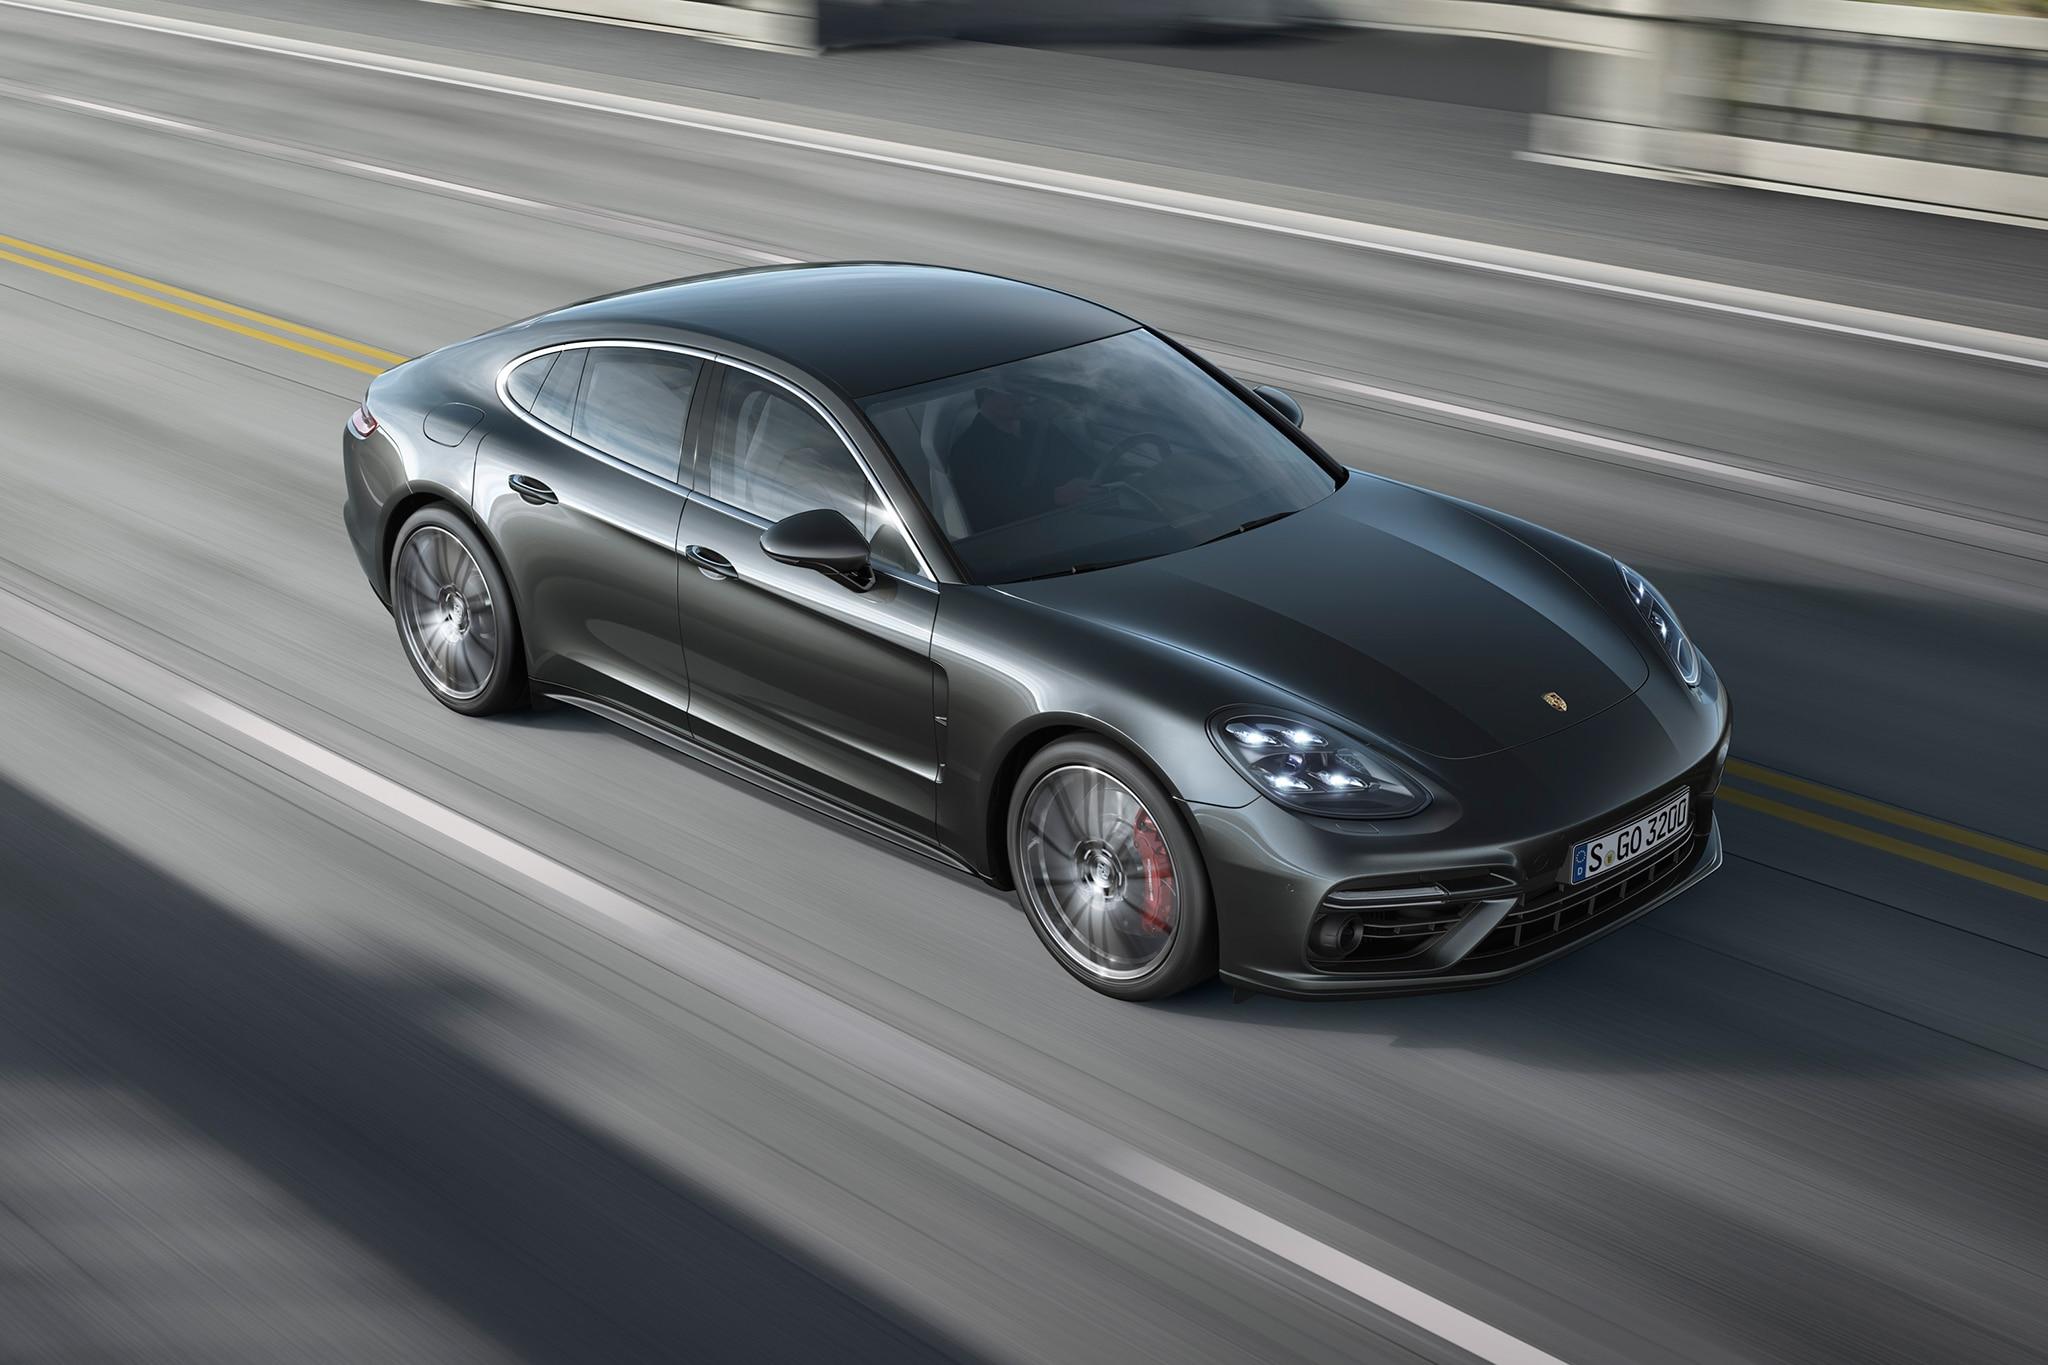 2017 Porsche Panamera Debuts With Fresh Design Powertrains